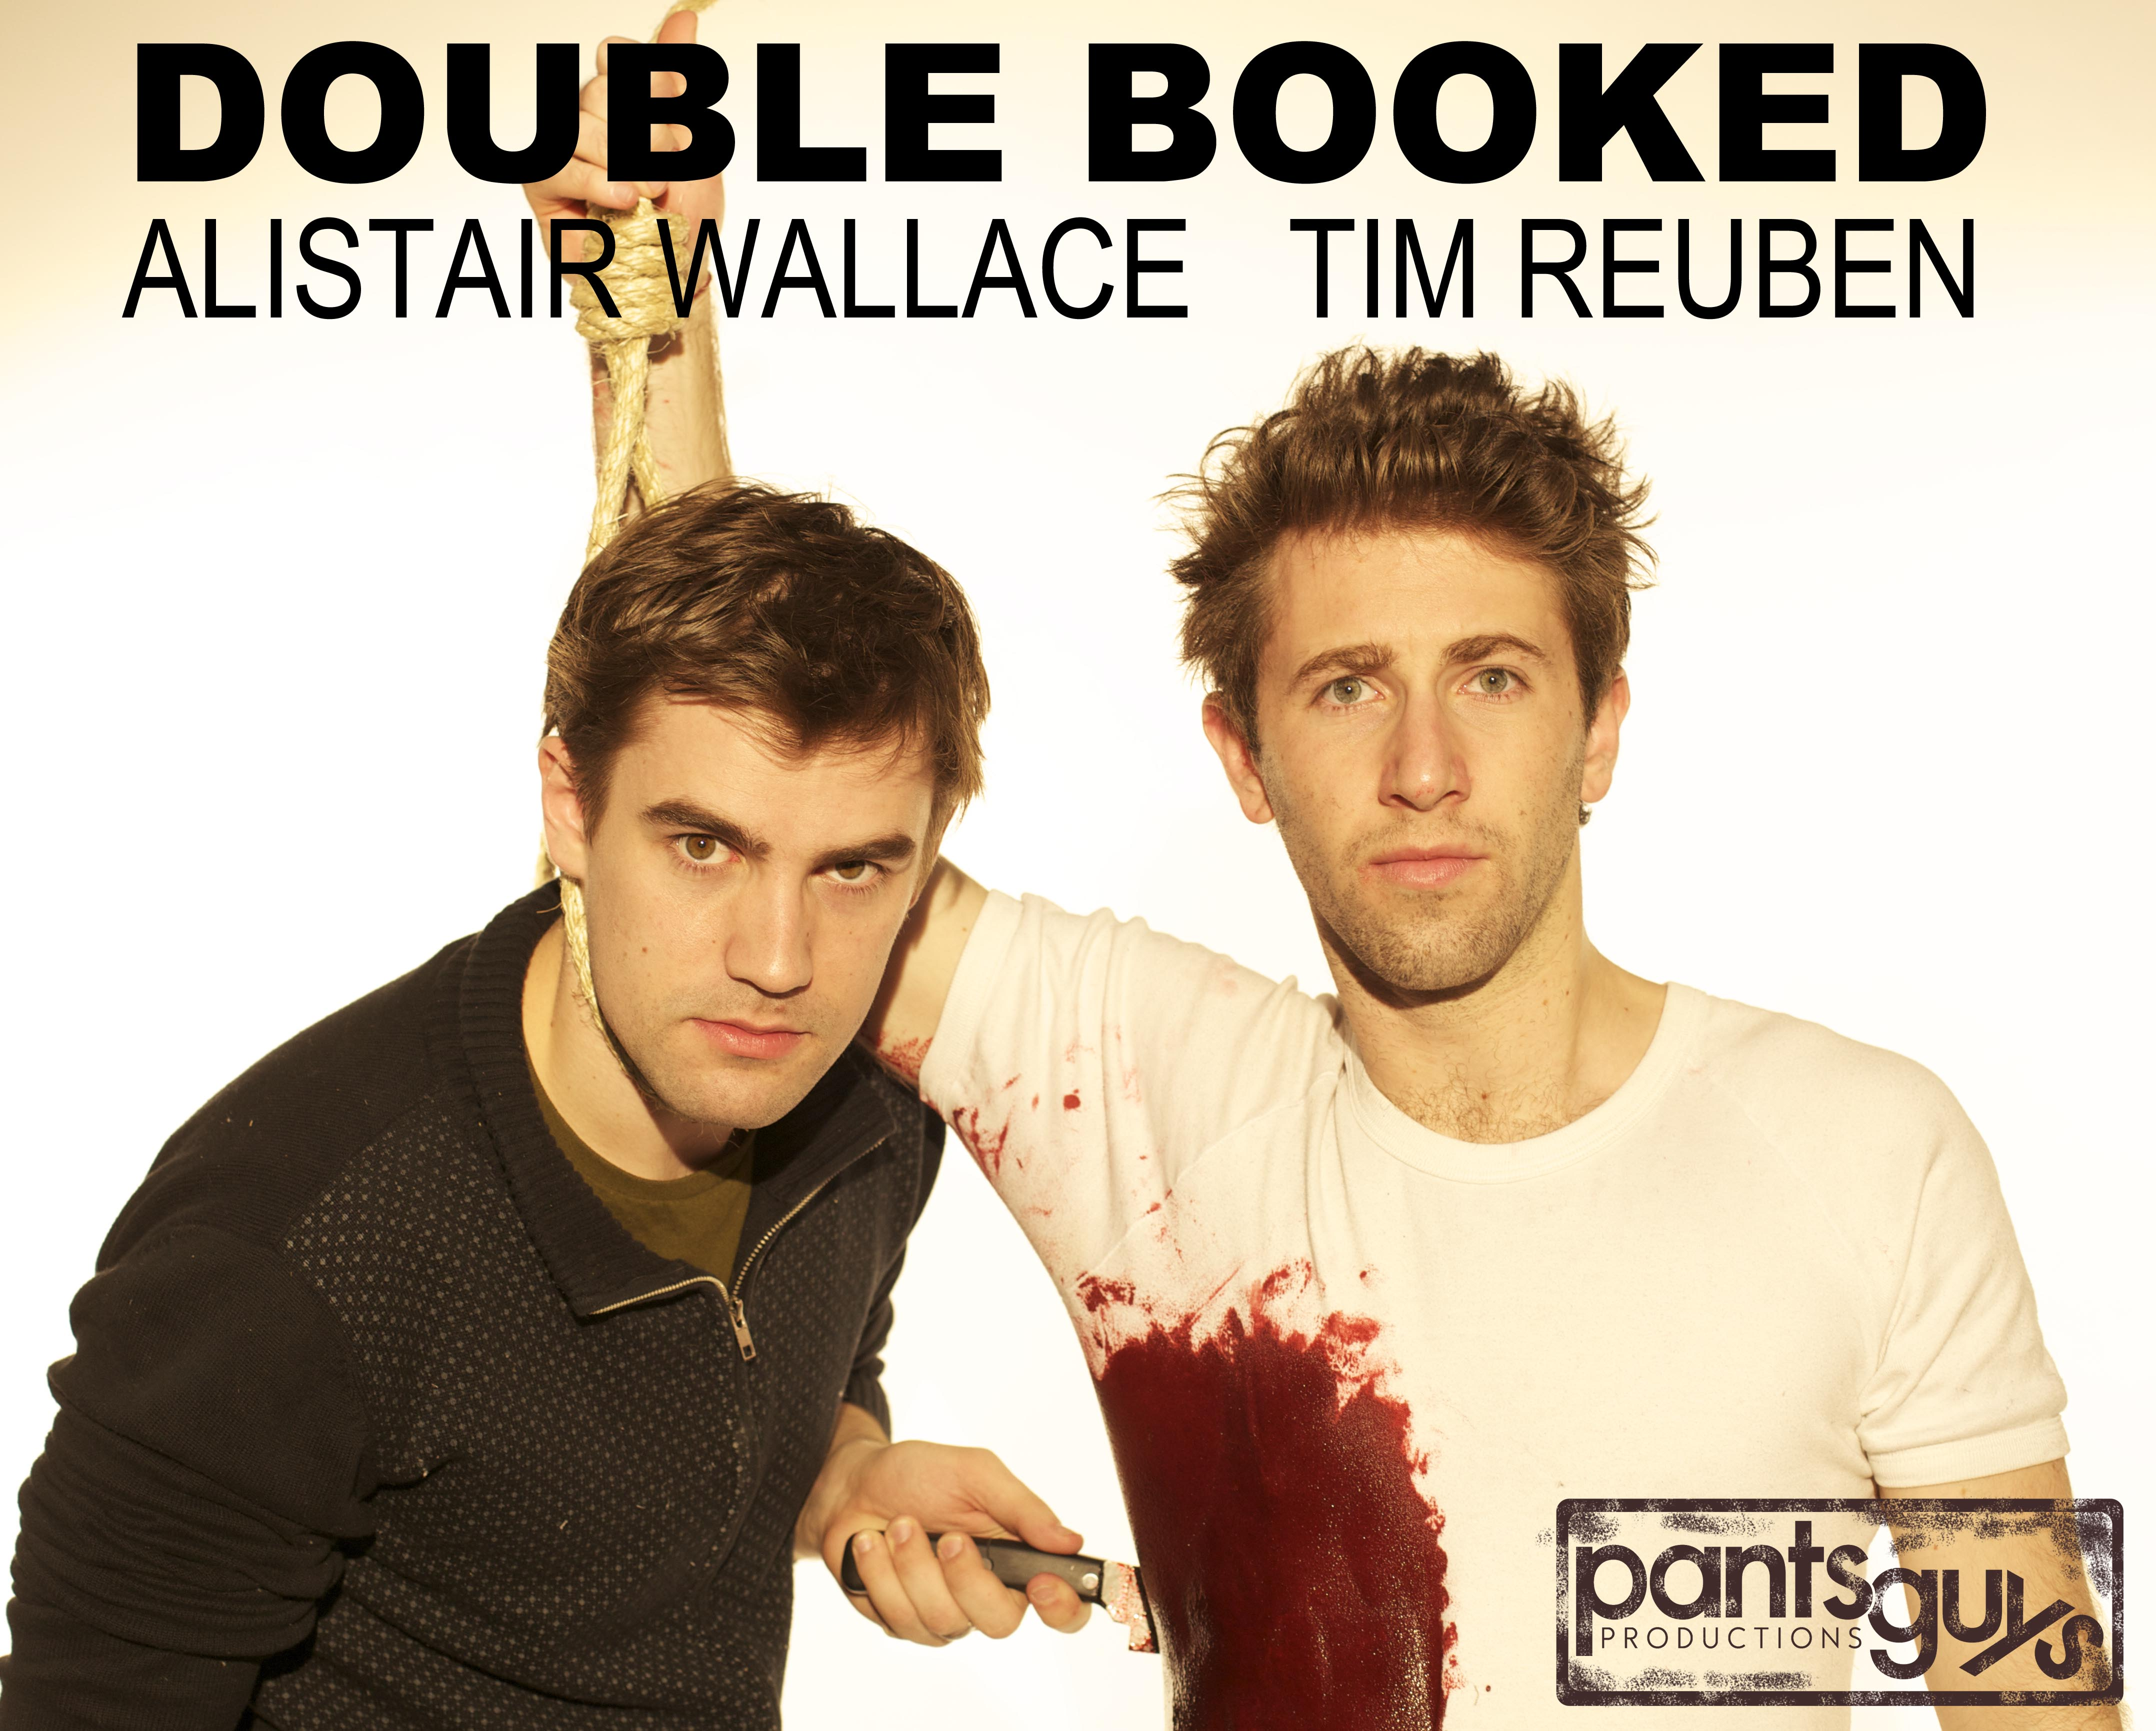 Double Booked Brochure Image xml